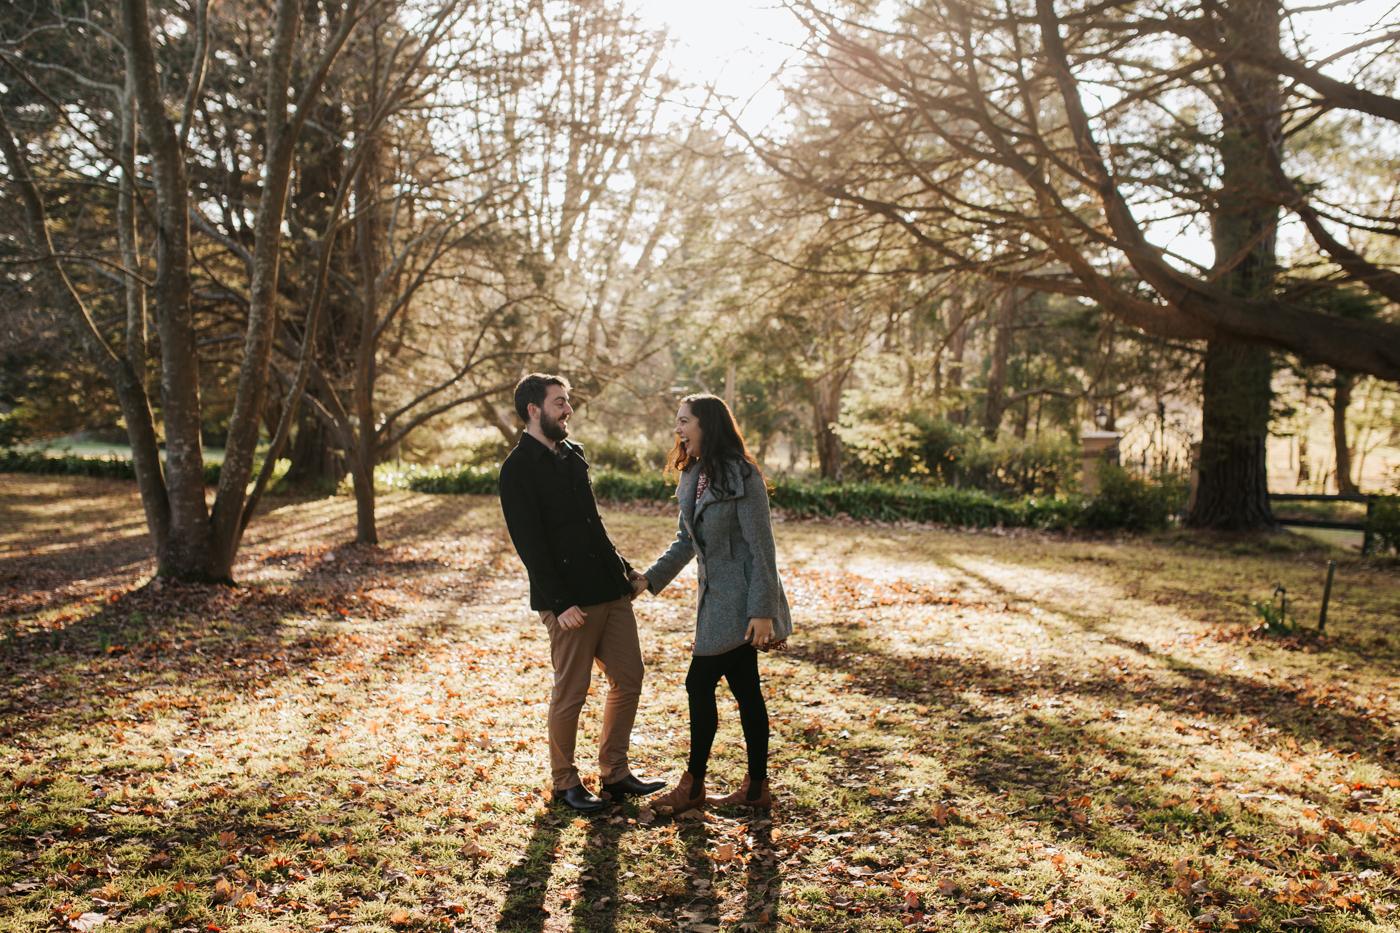 Kate & Kieran - Southern Highlands Engagement - Samantha Heather Photography-7.jpg